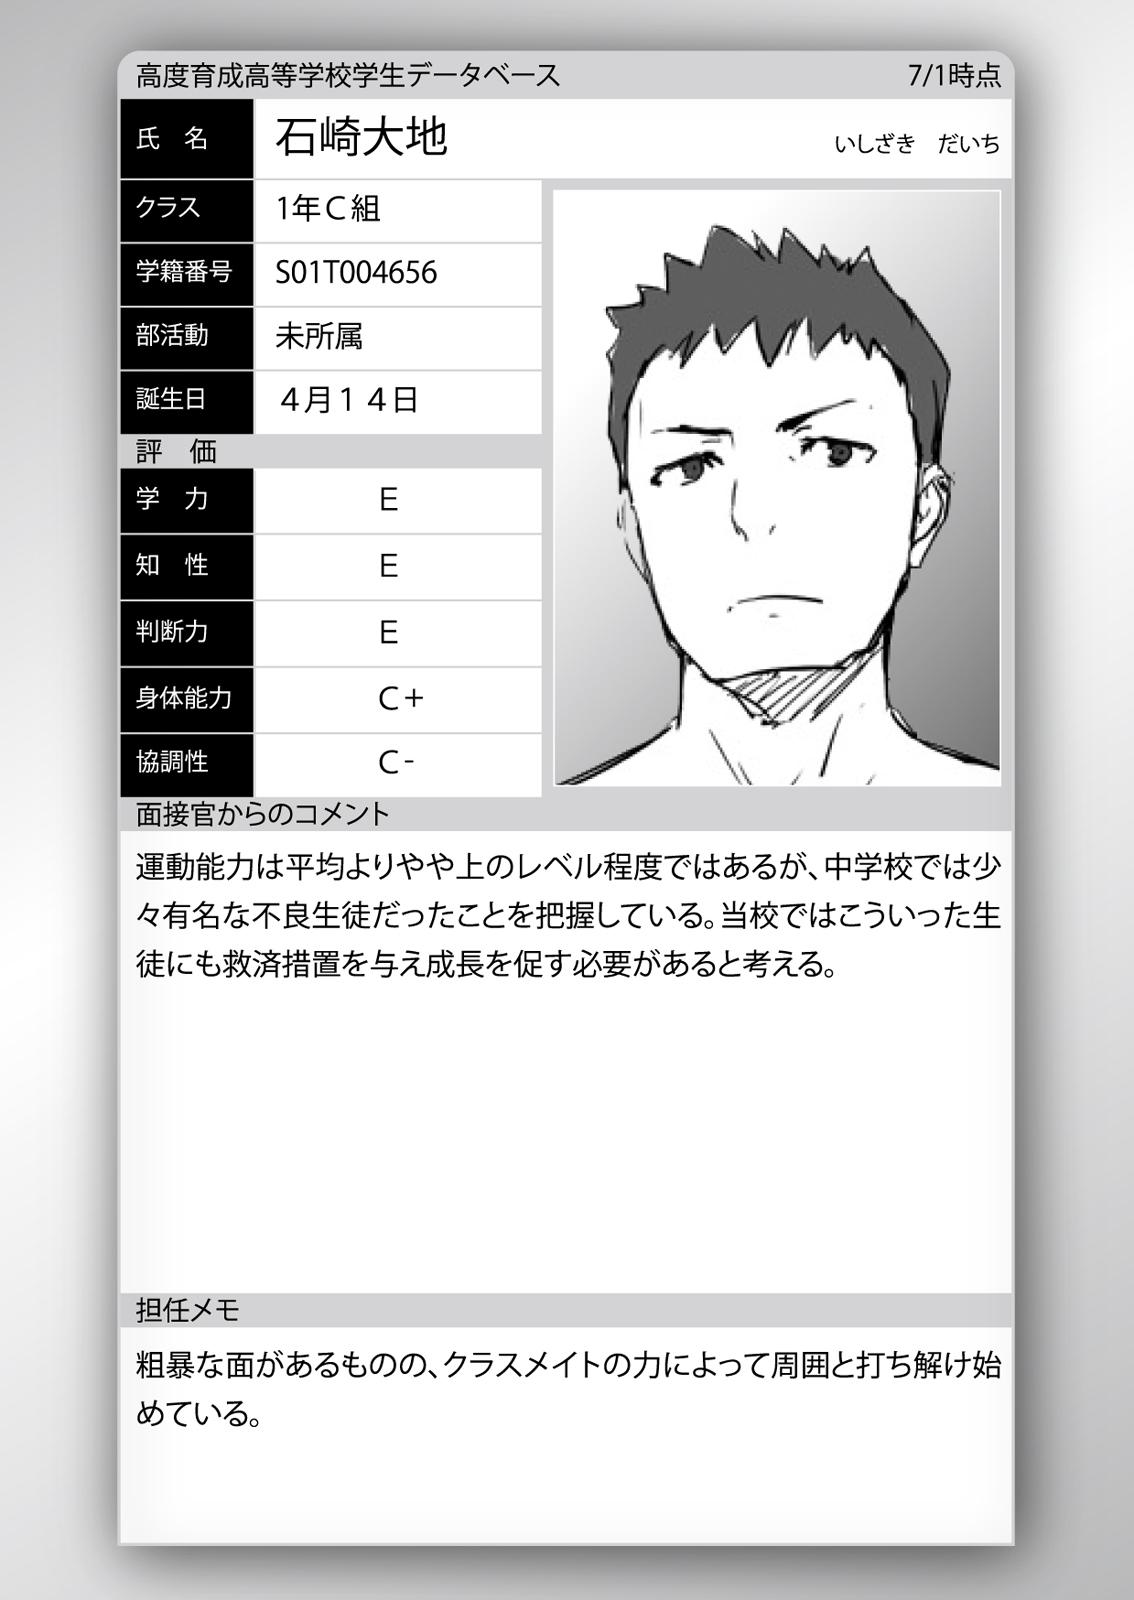 default.jpg